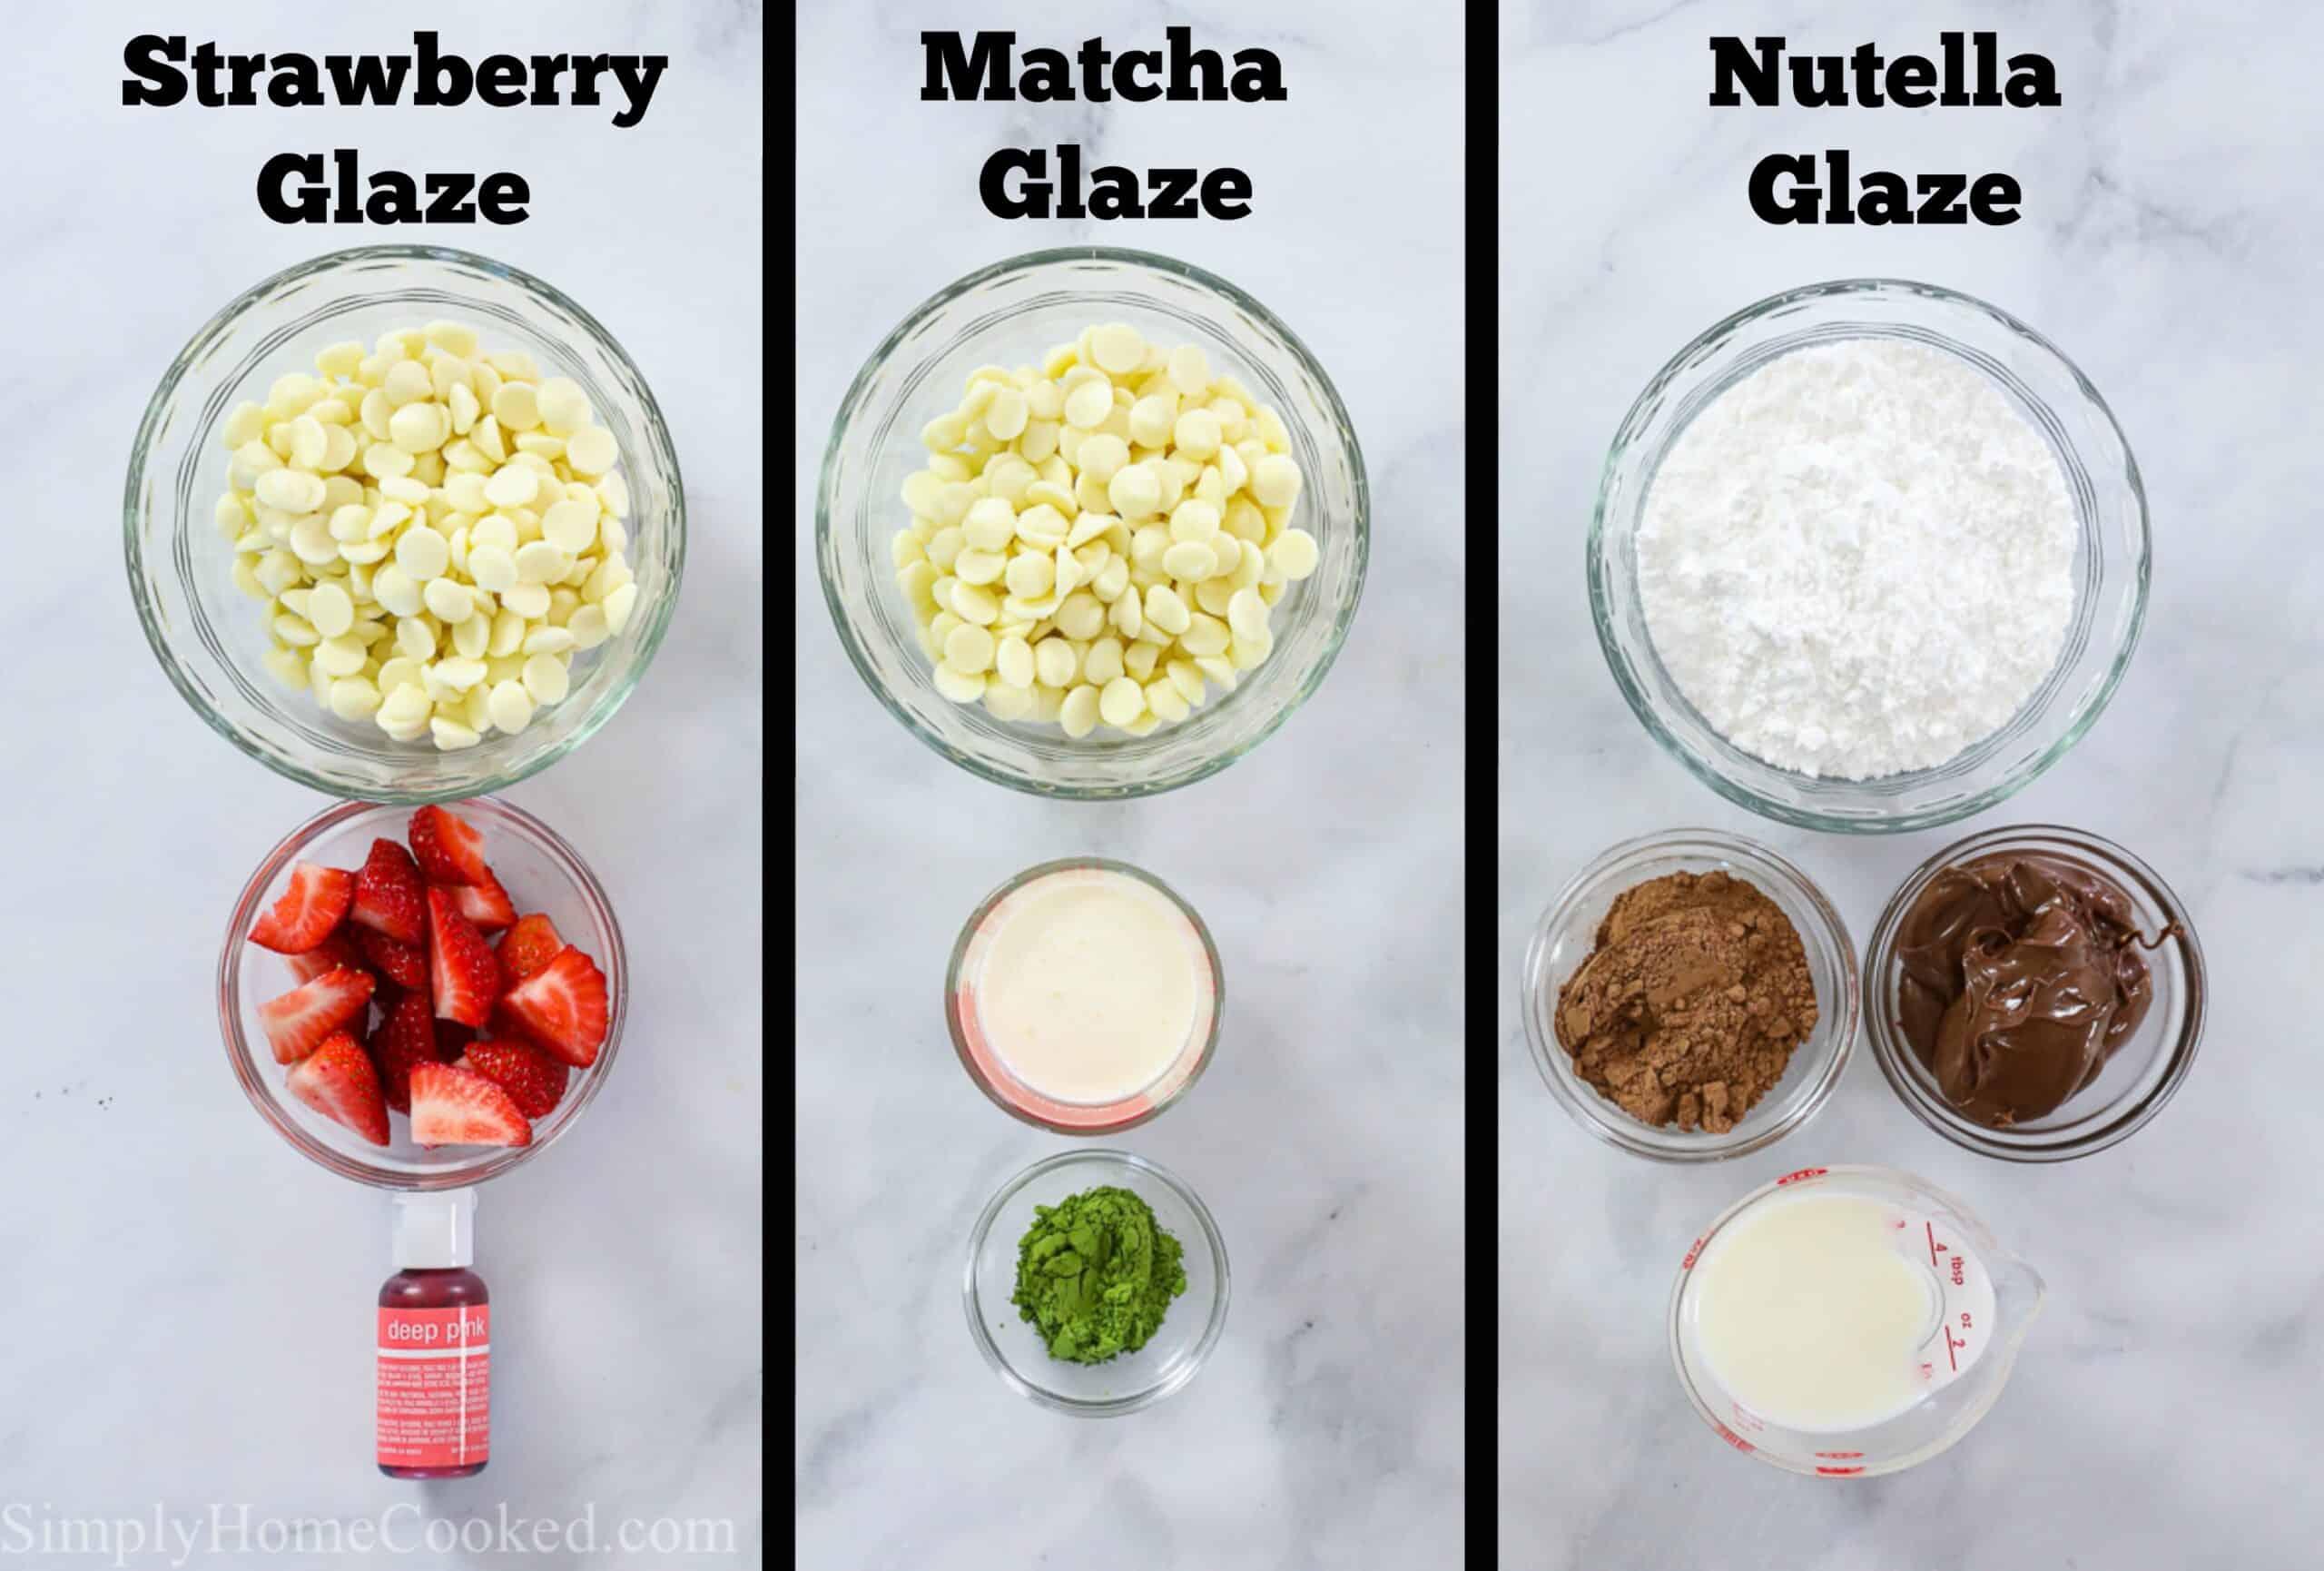 Ingredients for Best Mochi Donut glazes, Strawberry, Matcha, and Nutella.